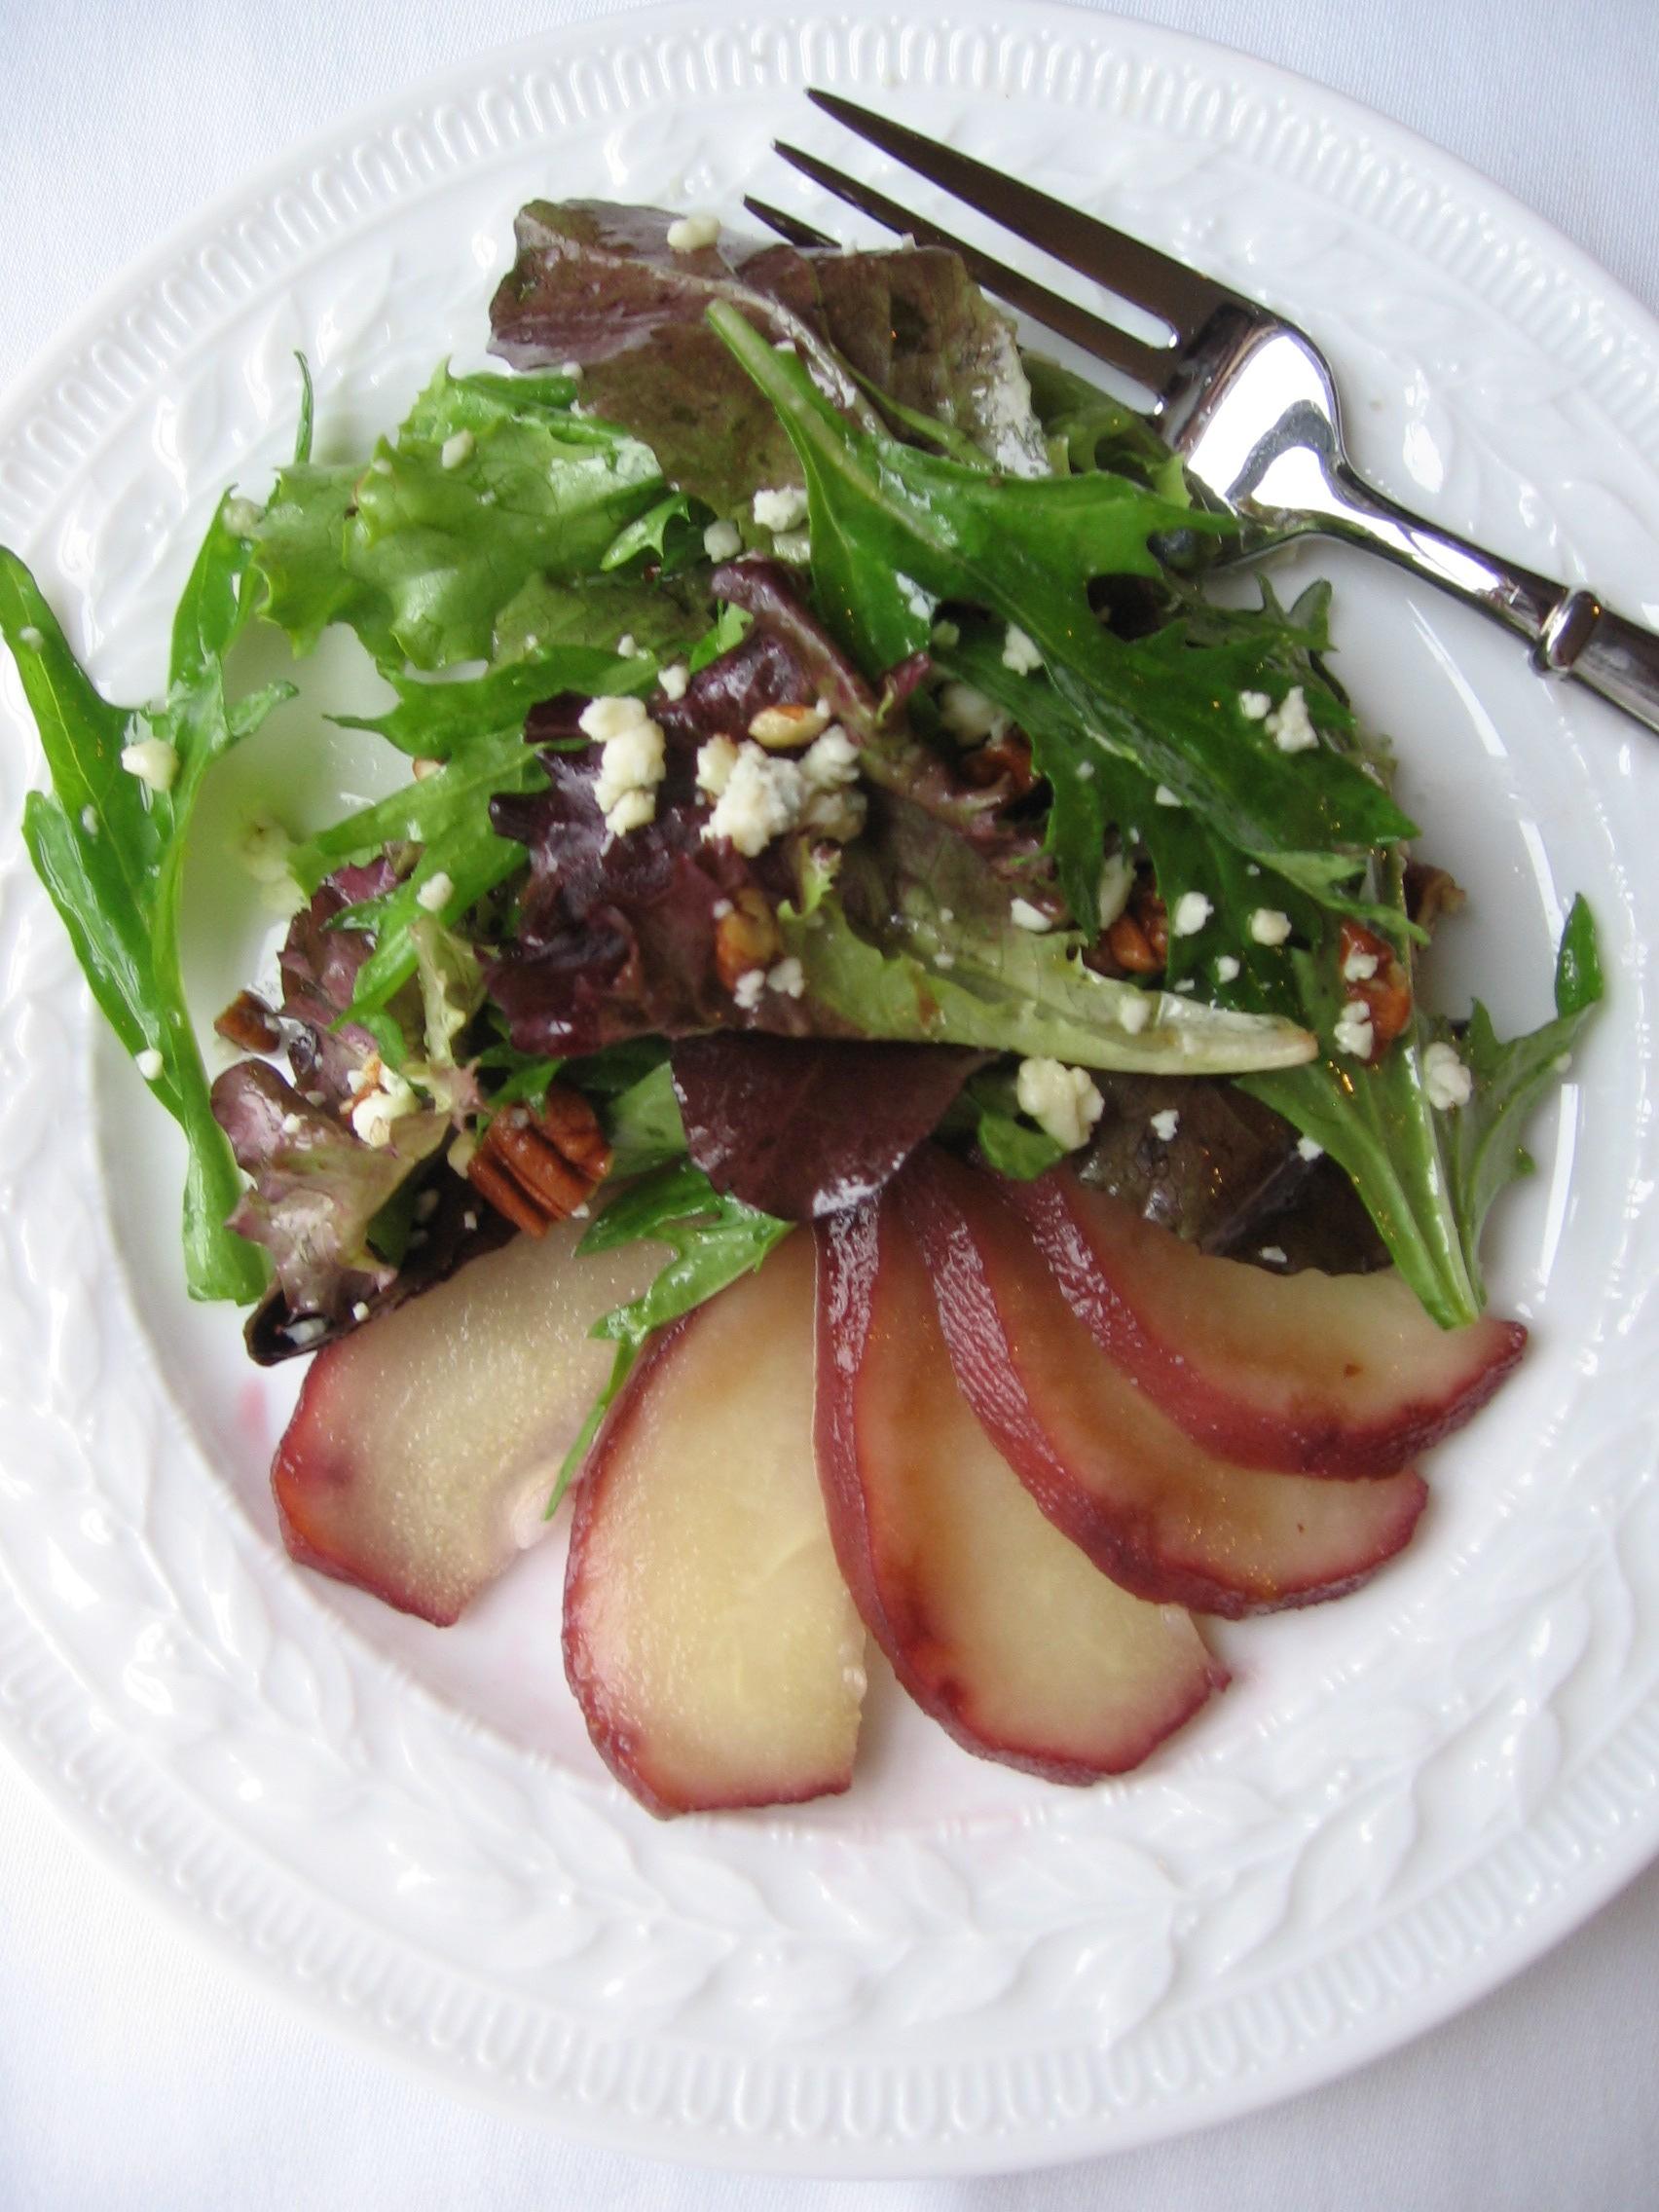 Poached Pear and Gorgonzola Salad